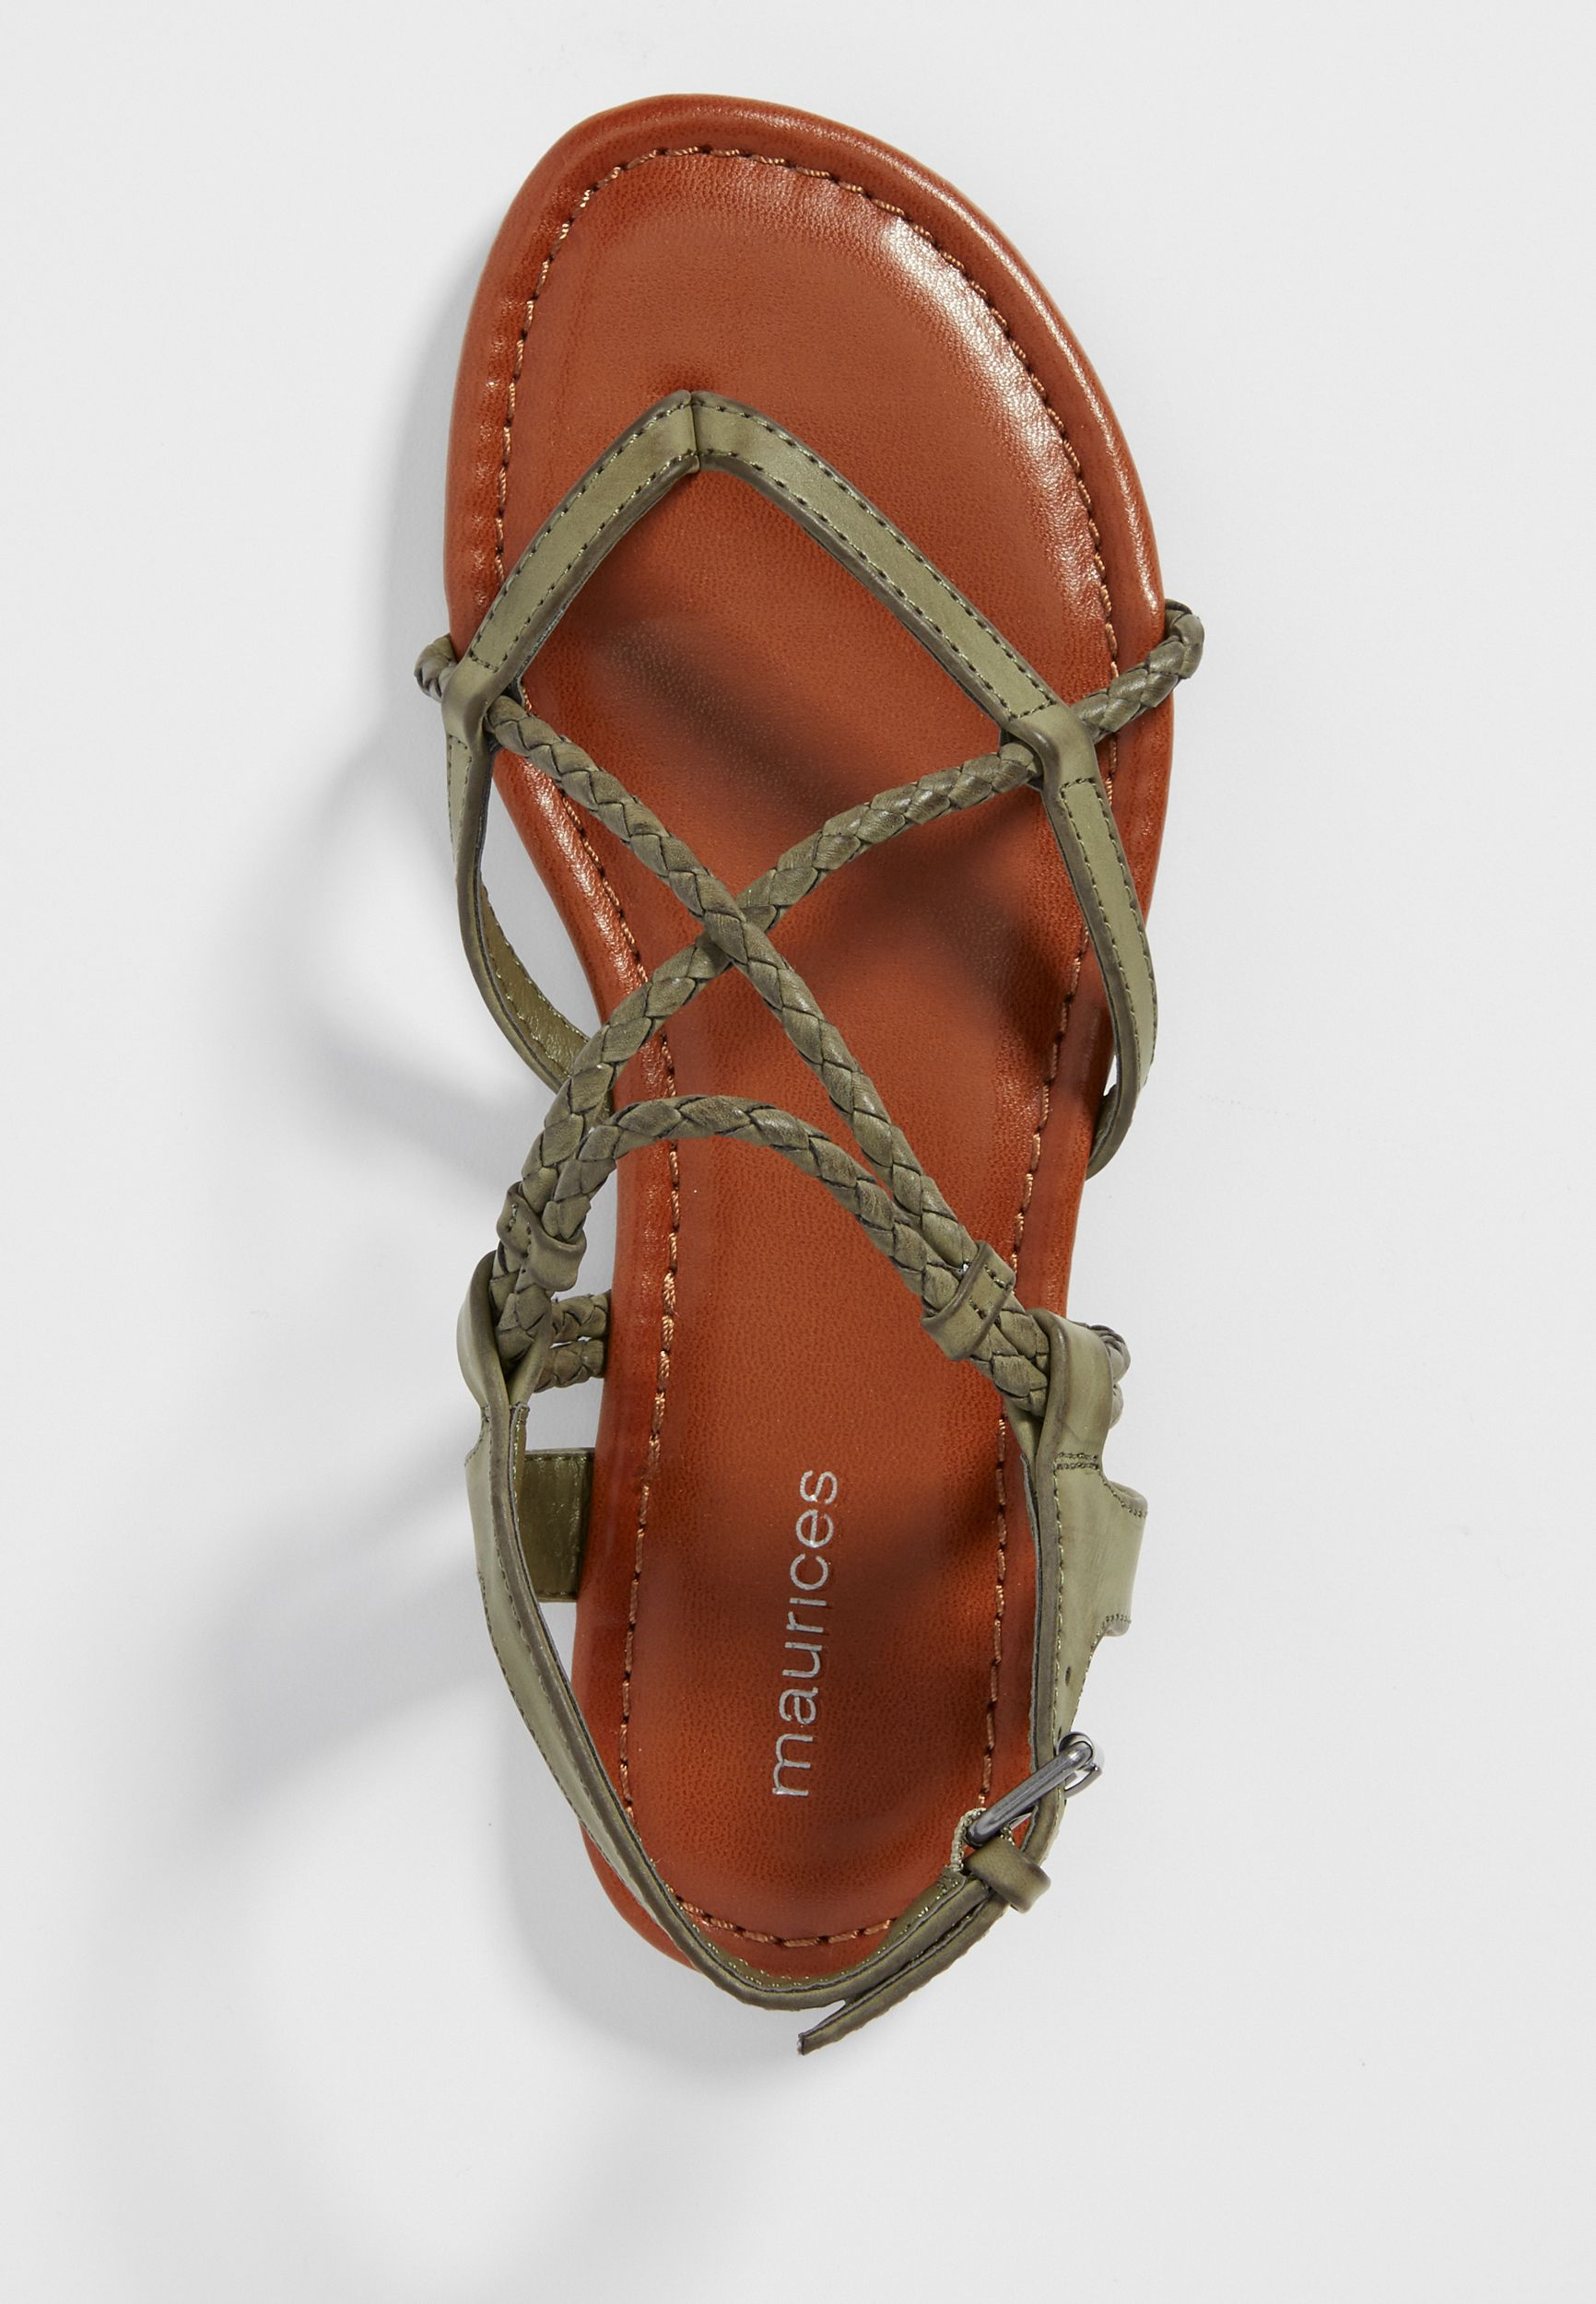 7924ec875a56 Adalie braided strap sandal (original price